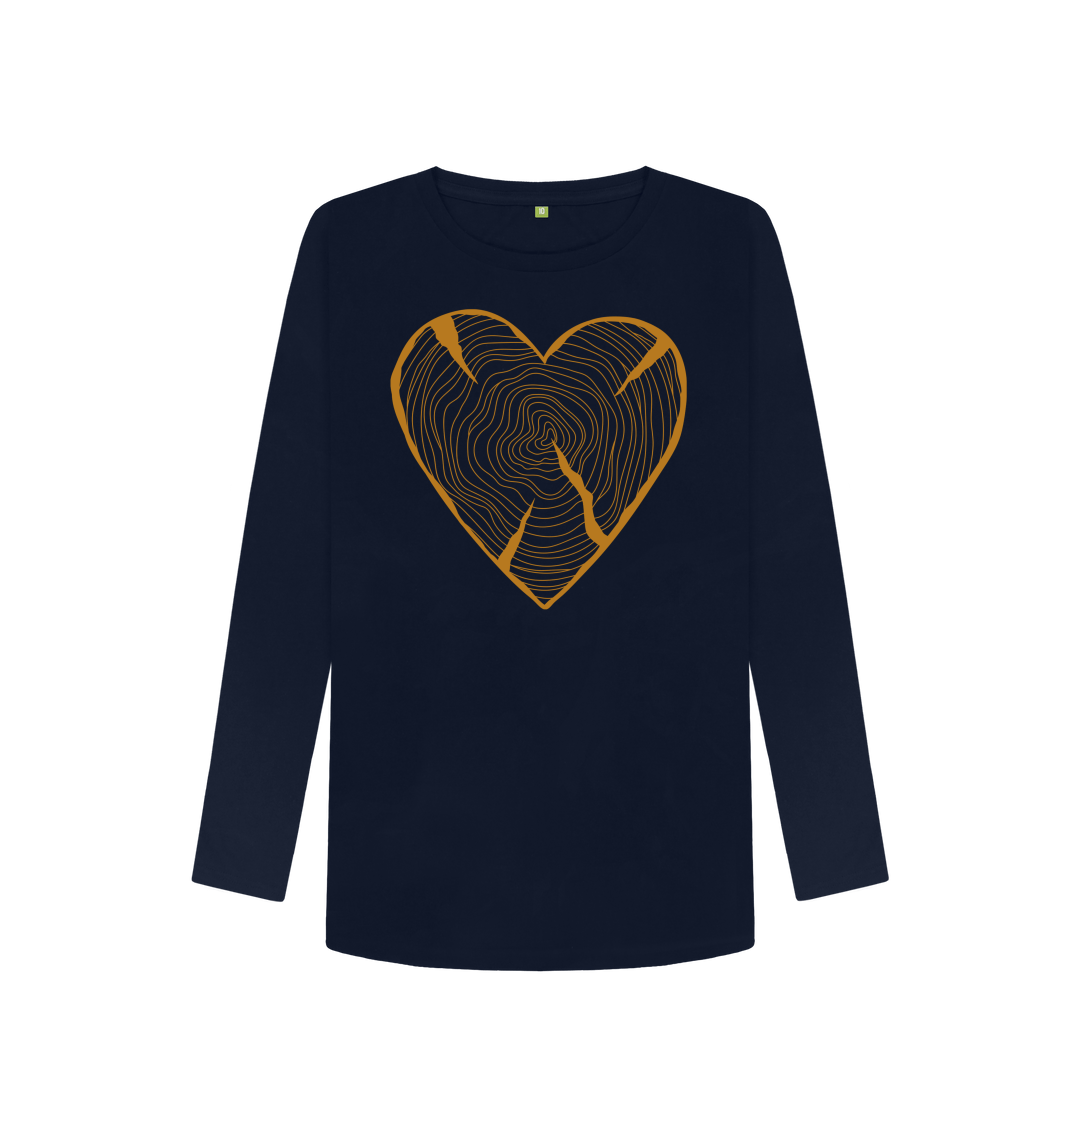 Women's Nature Lovers Adventure Heart Tree Trunk Rings Long Sleeved Top – Organic Cotton, Vegan Kind Shop 7